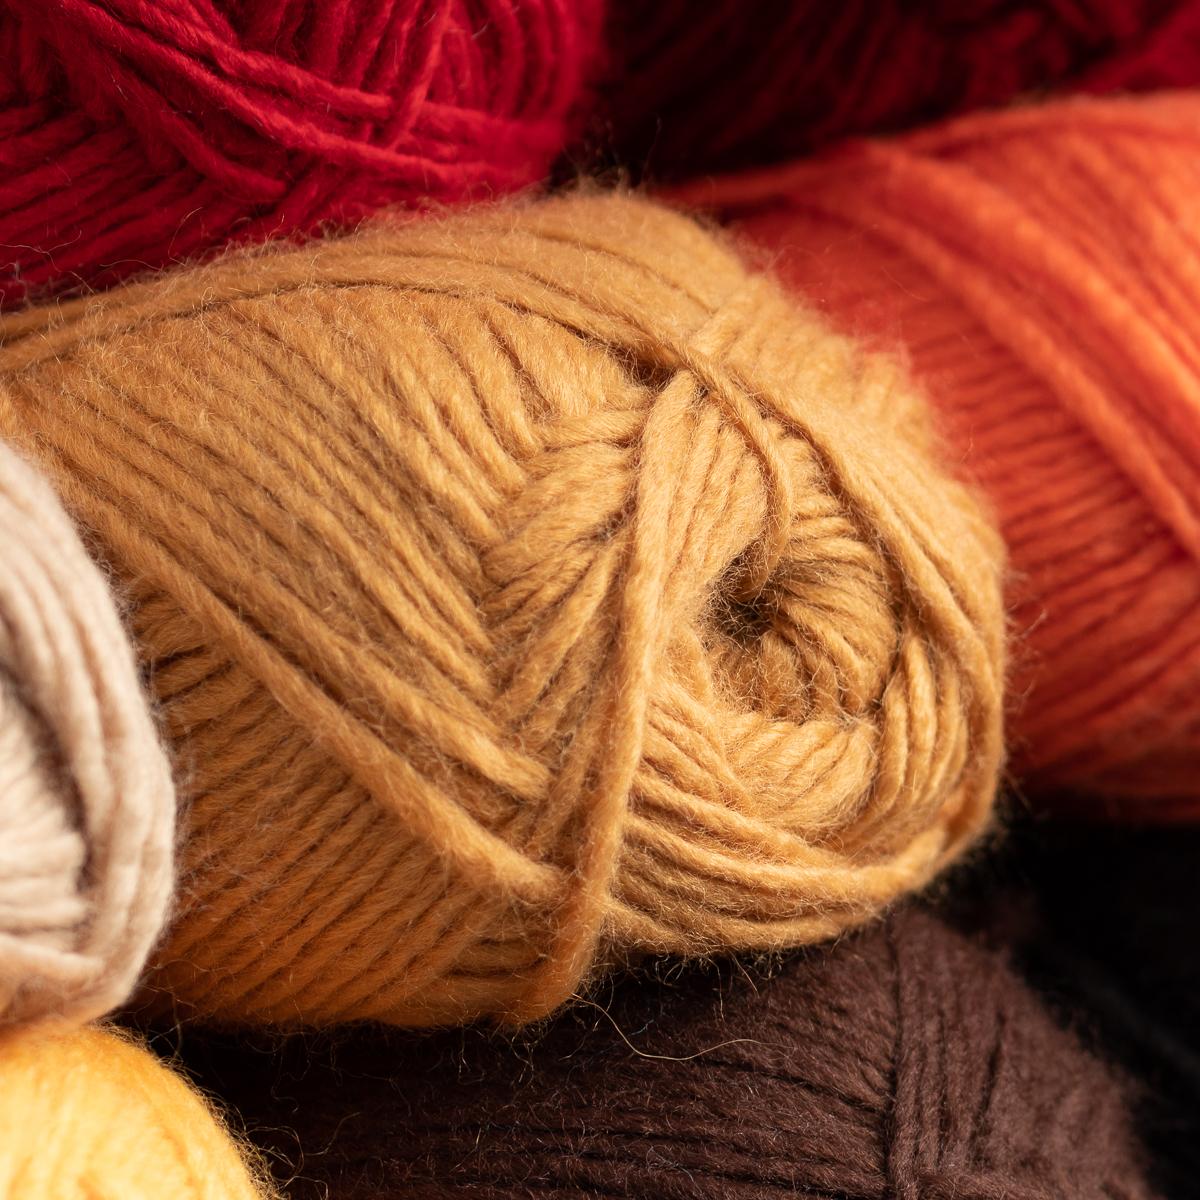 3pk-Lion-Brand-New-Basic-Acrylic-amp-Wool-Yarn-Medium-4-Knit-Crochet-Skeins-Soft thumbnail 26